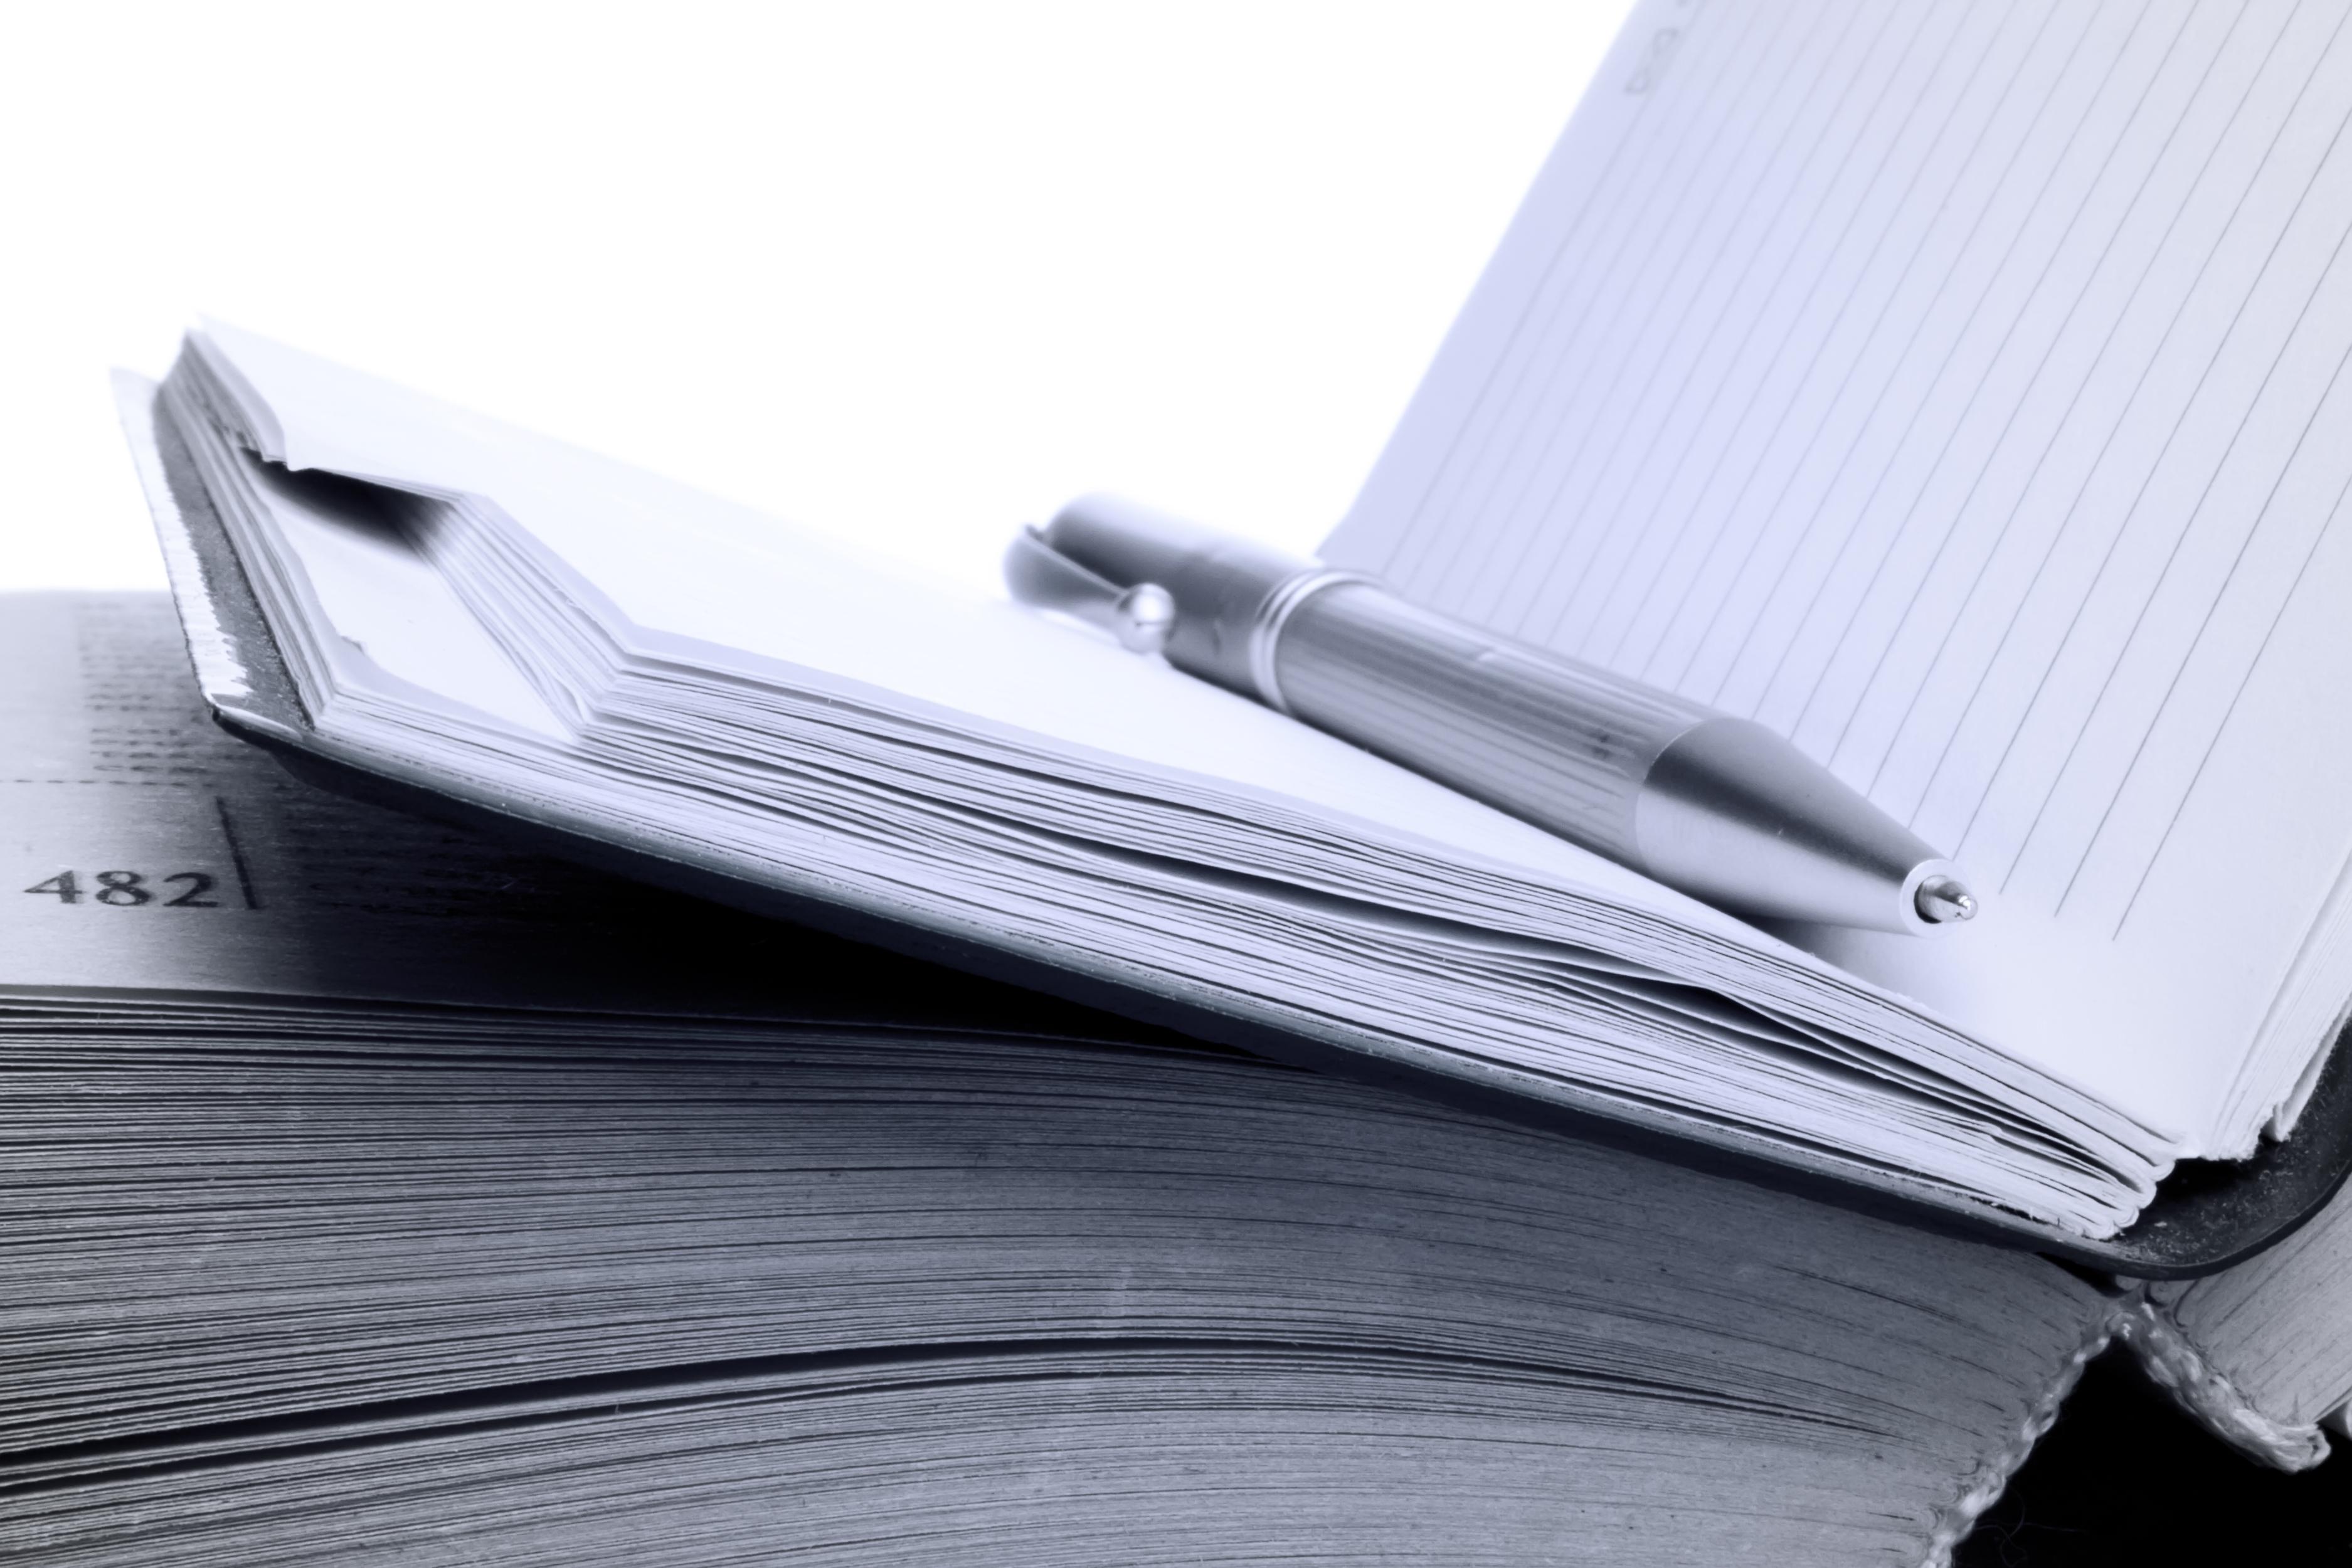 Pen on notebook, Blue, Book, Close-up, Closeup, HQ Photo